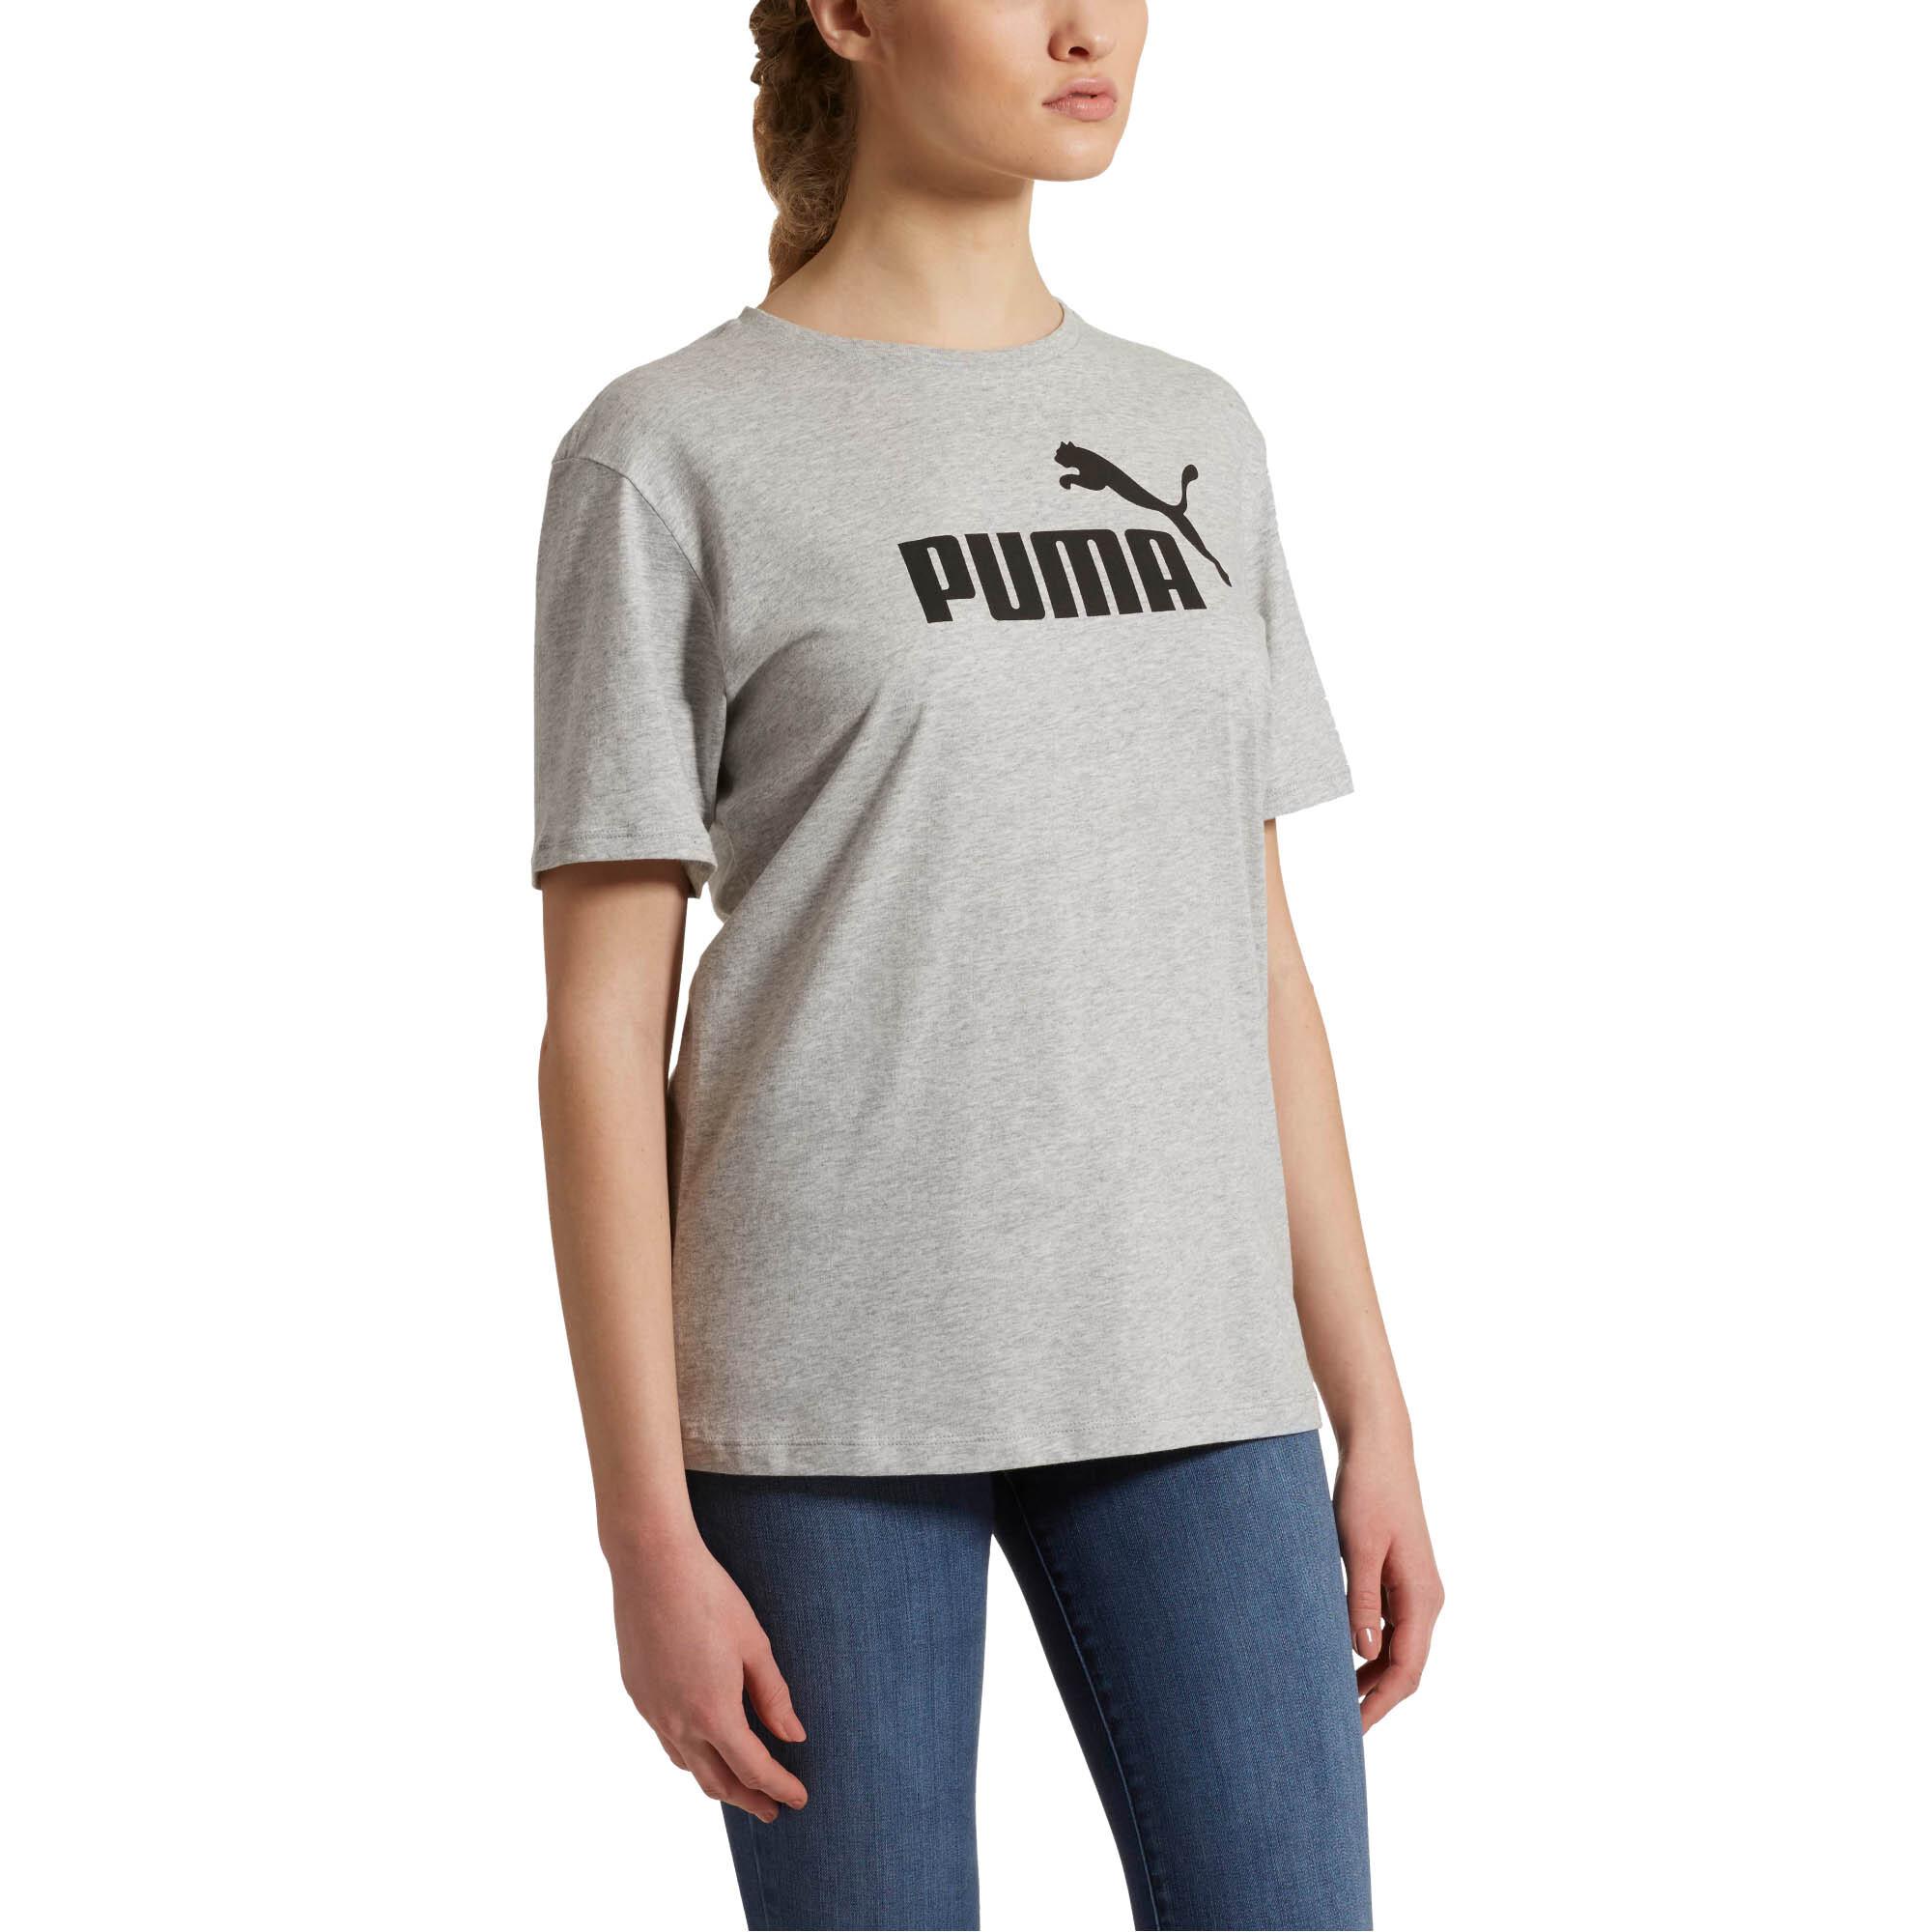 Shirts Activewear Logo Womens Ladies Sports Fashion Boyfriend T-shirt Tee Puma Essential